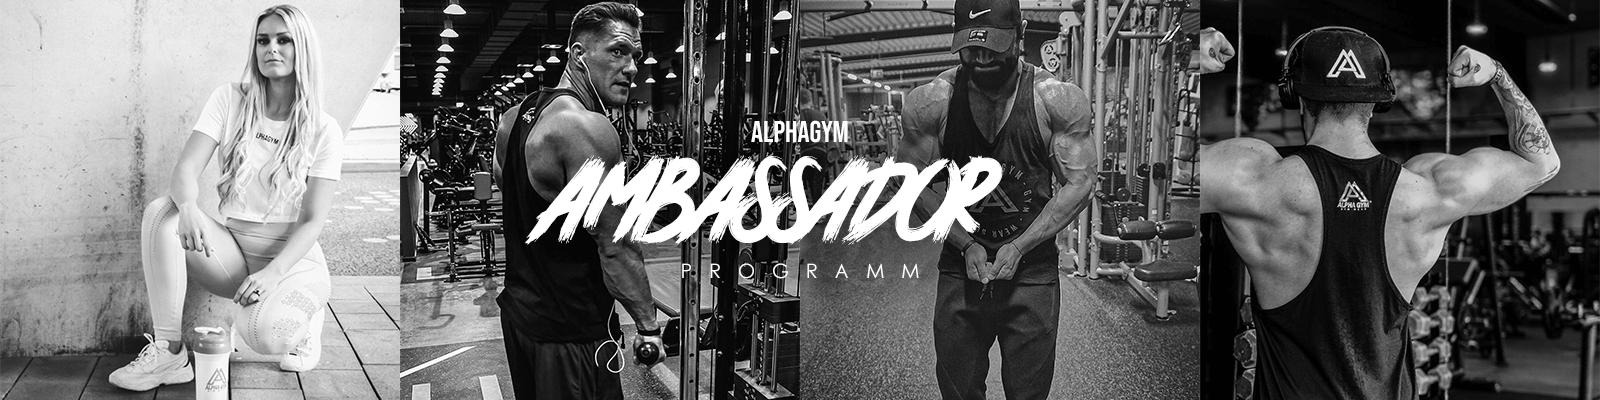 ALPHAGYM-Ambassador-Programm-min